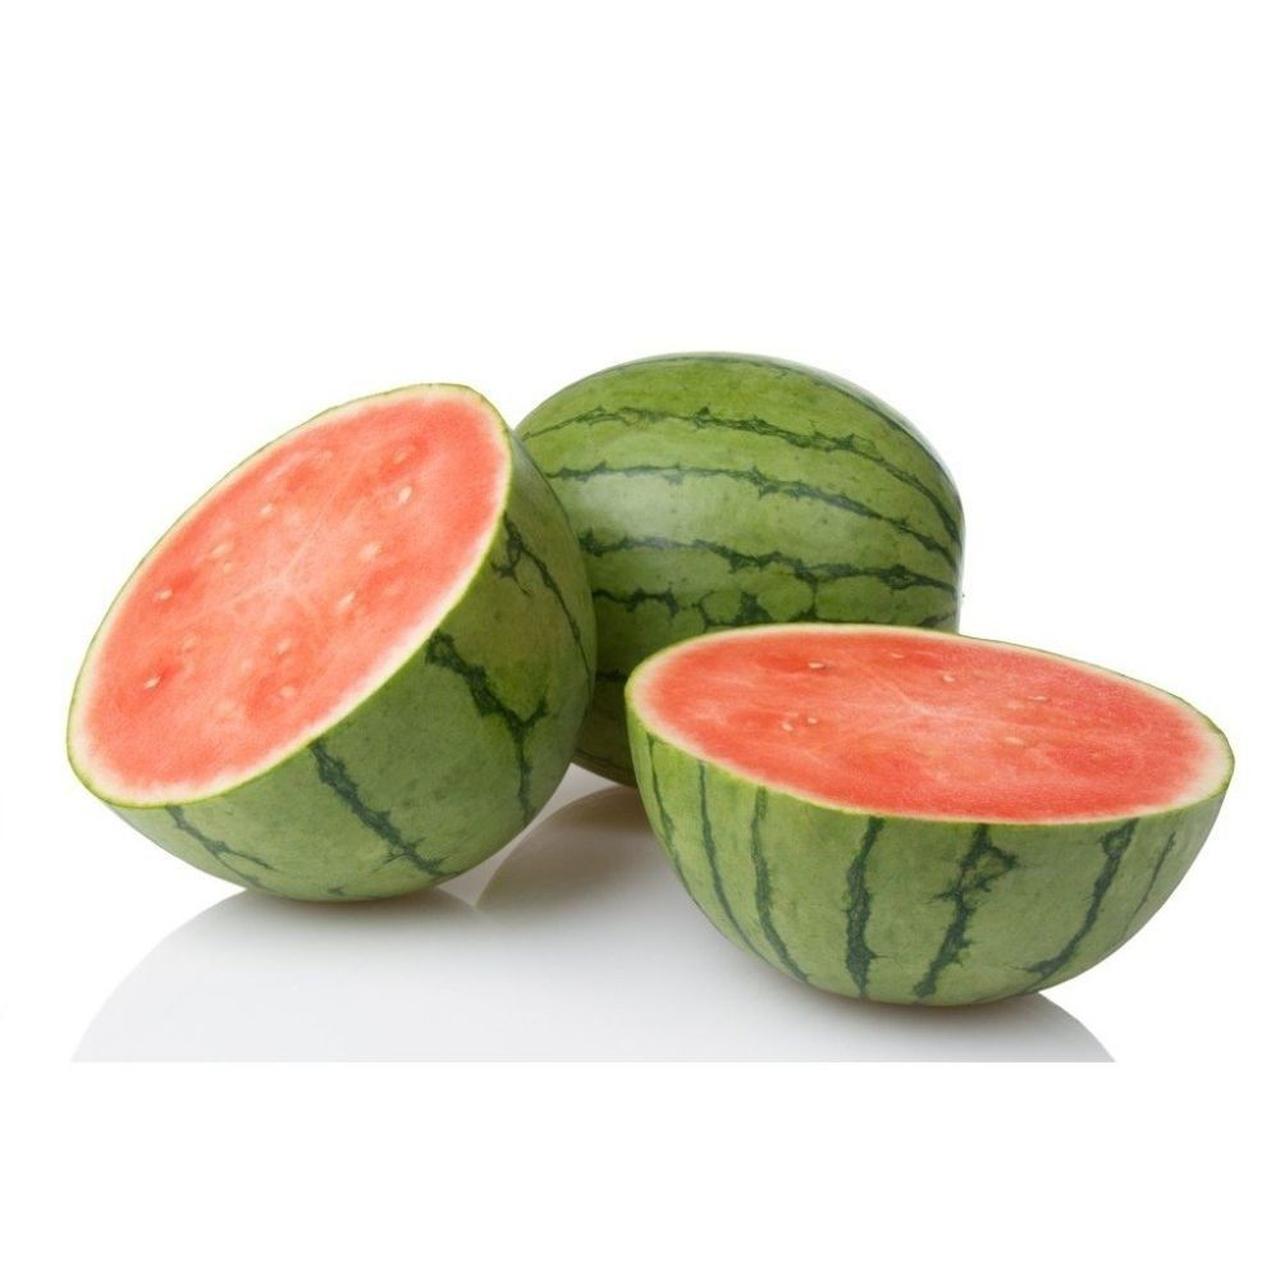 MELANCIA BABY (METADE)  - JJPIVOTTO - Comercio de Frutas